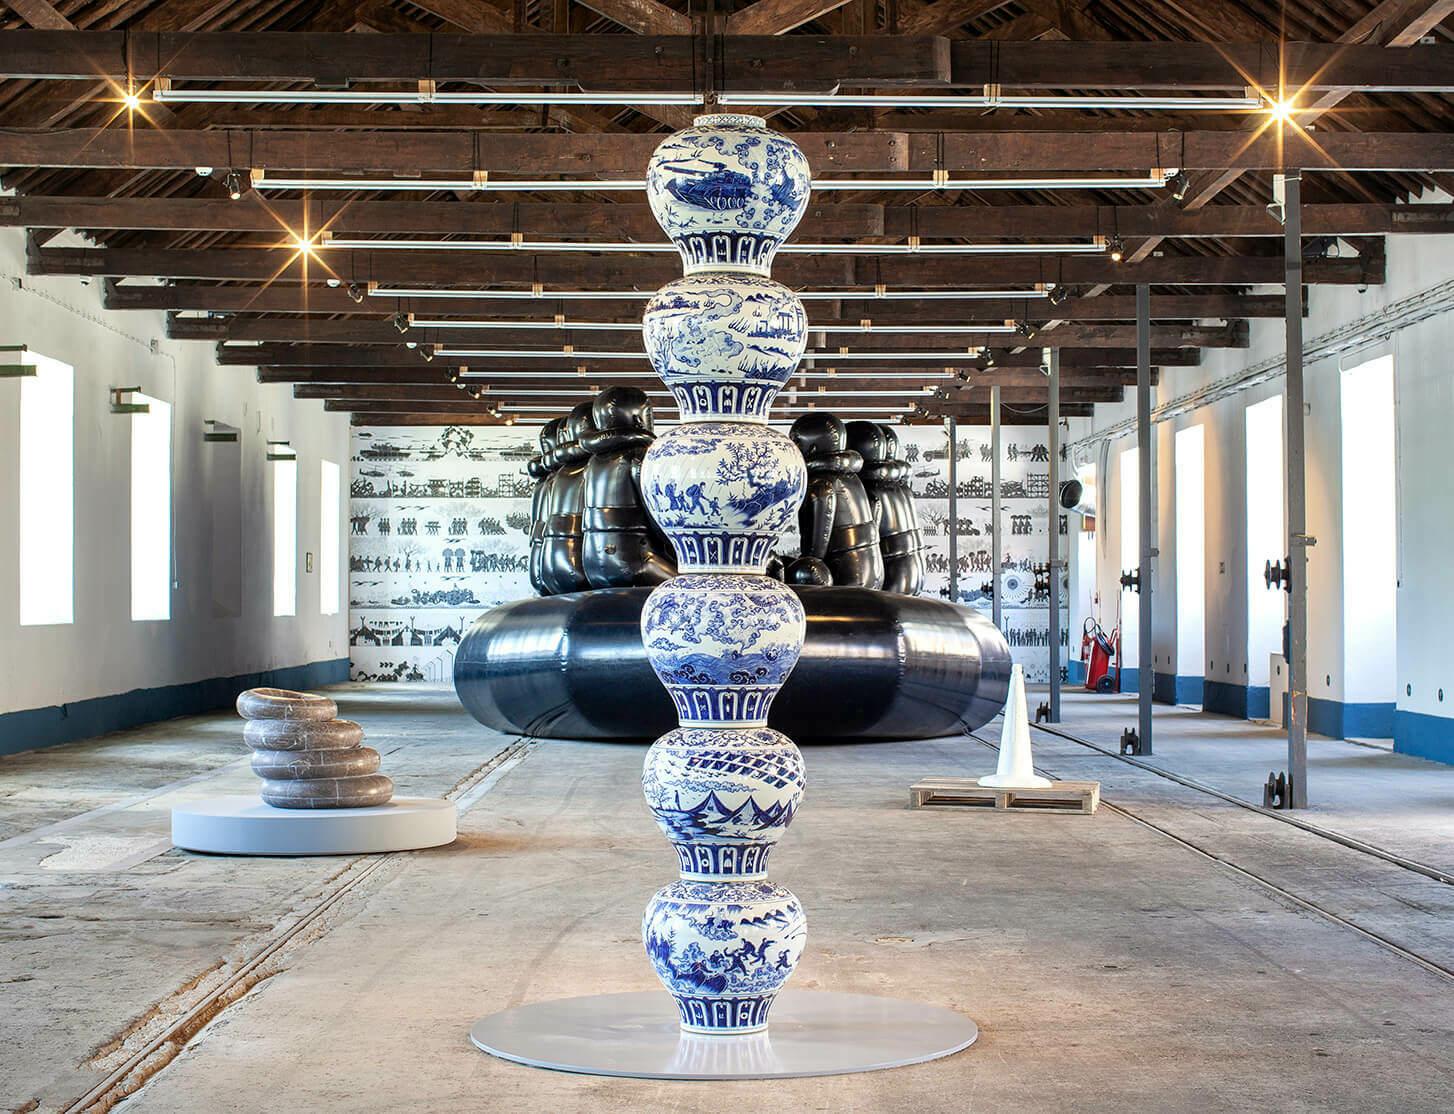 'Rapture', a major exhibition by Ai Weiwei, opens at Cordoaria Nacional in Lisbon